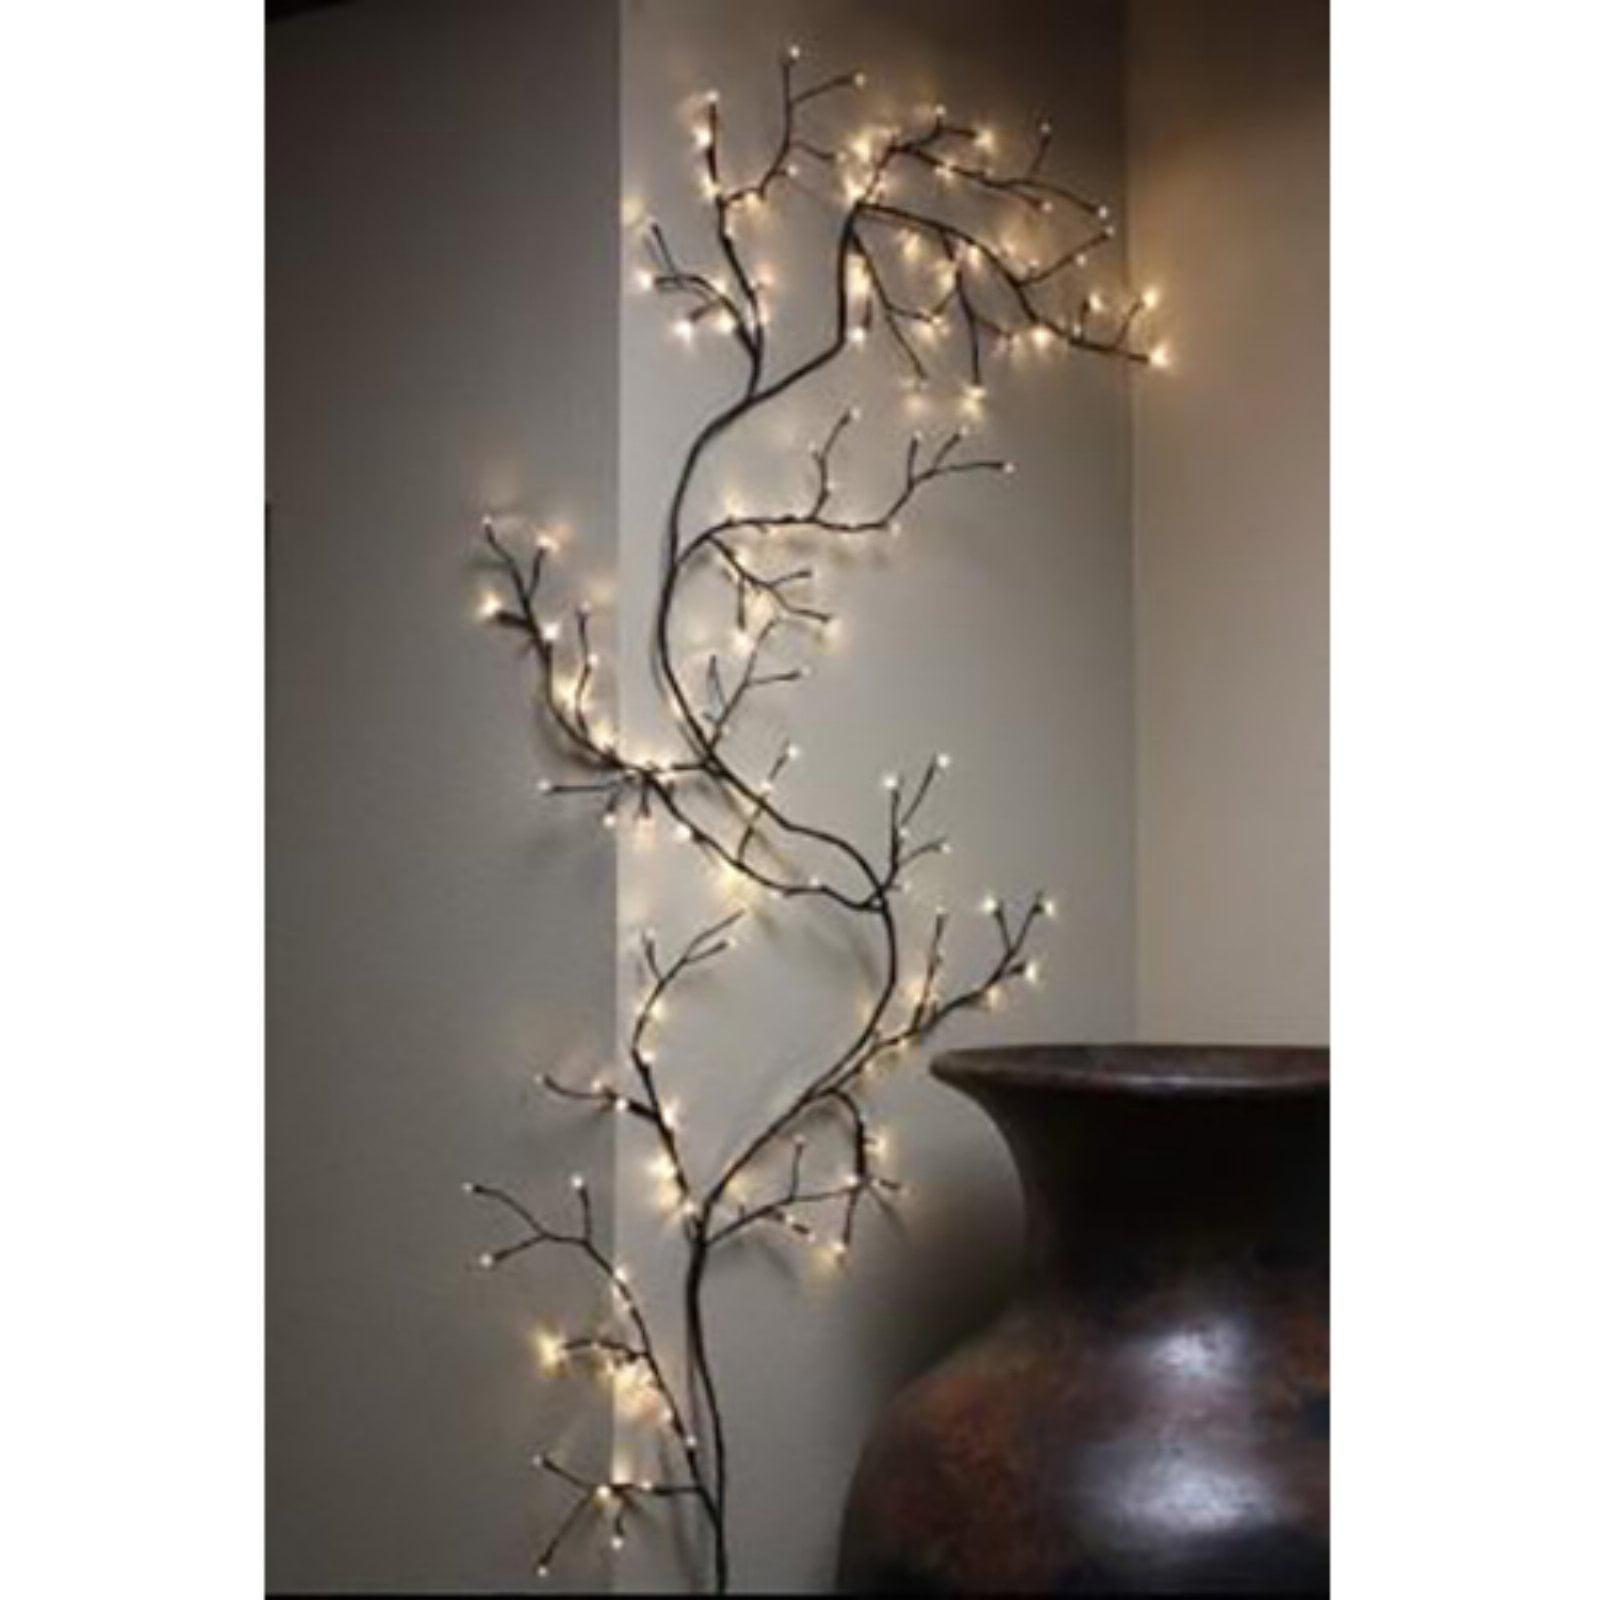 GARLAND VINE - 144 WARM WHITE LEDS